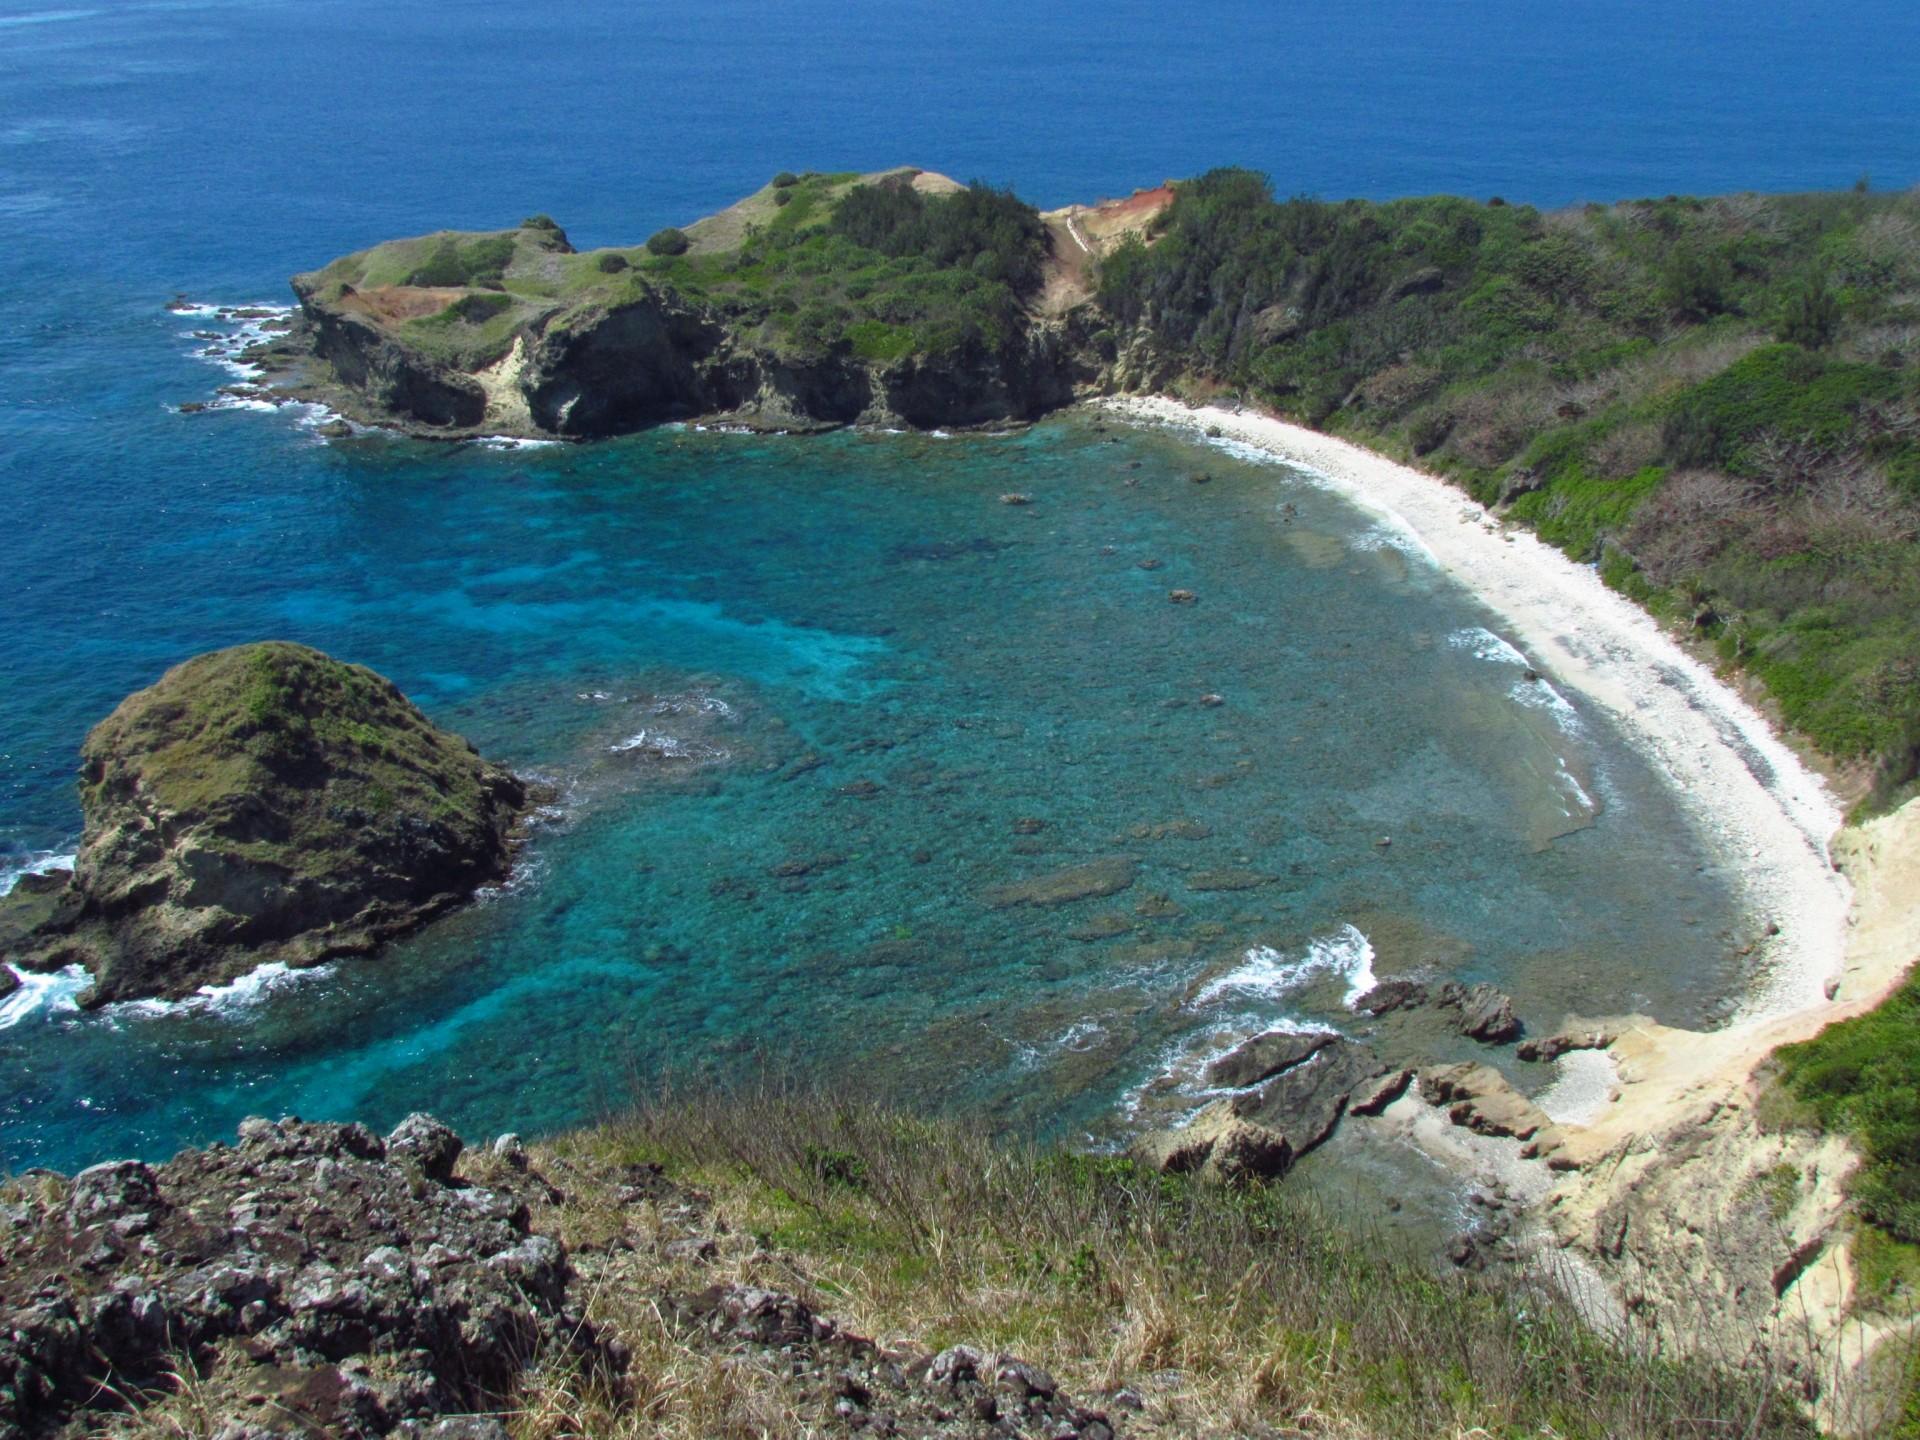 Beautiful Ogasawara Islands 6 days Summer 2021